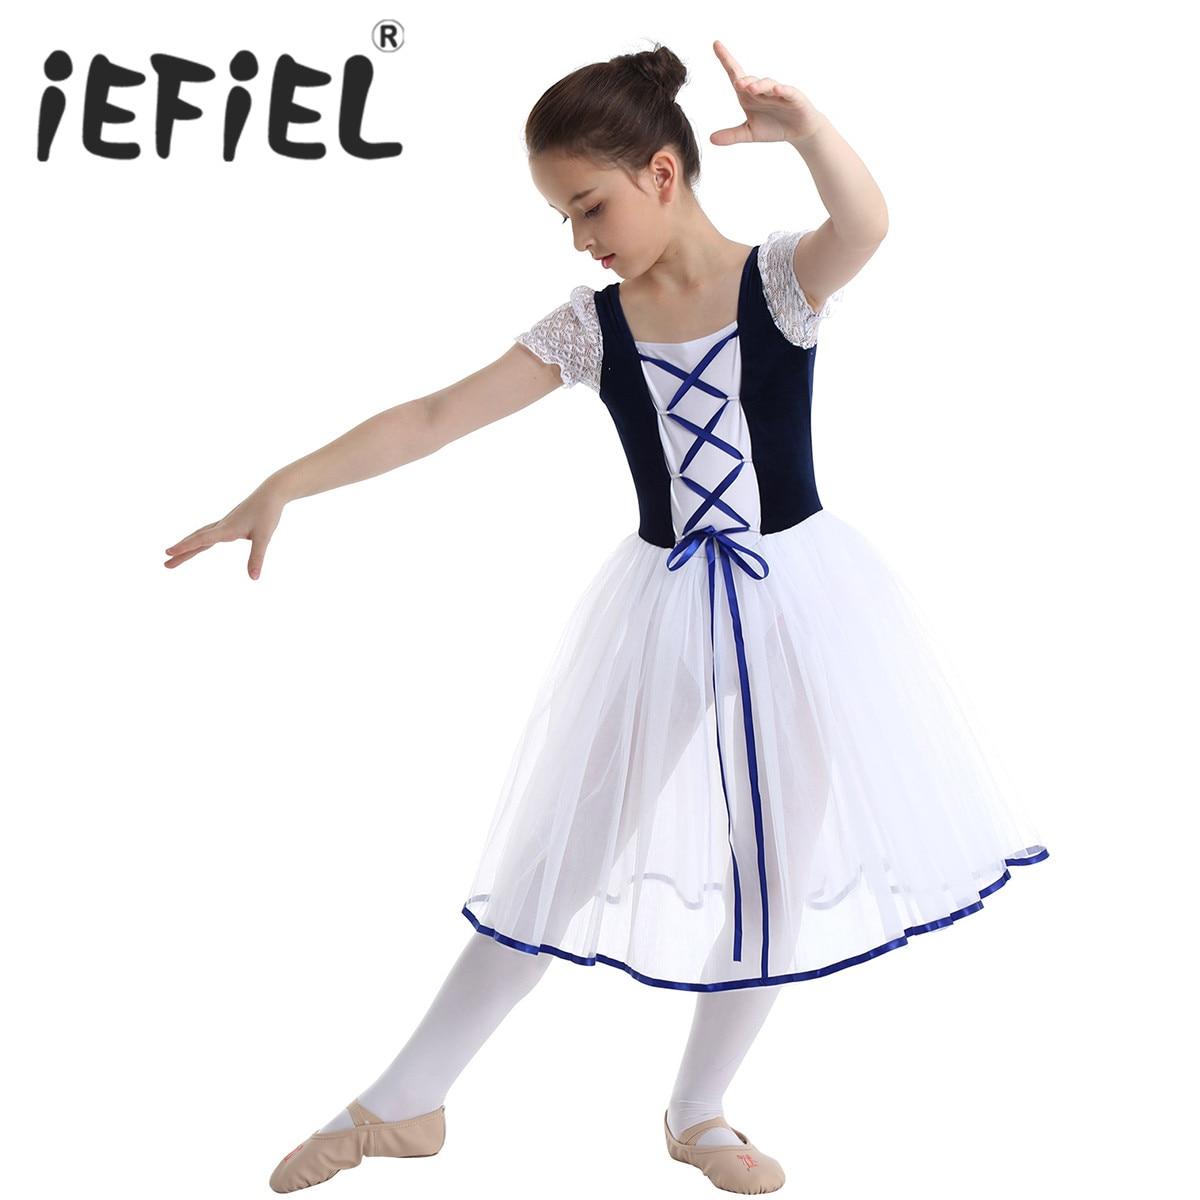 DANCE Costume Ruffled Shorty unitard 3 Colors Foil separate belt ch//adult